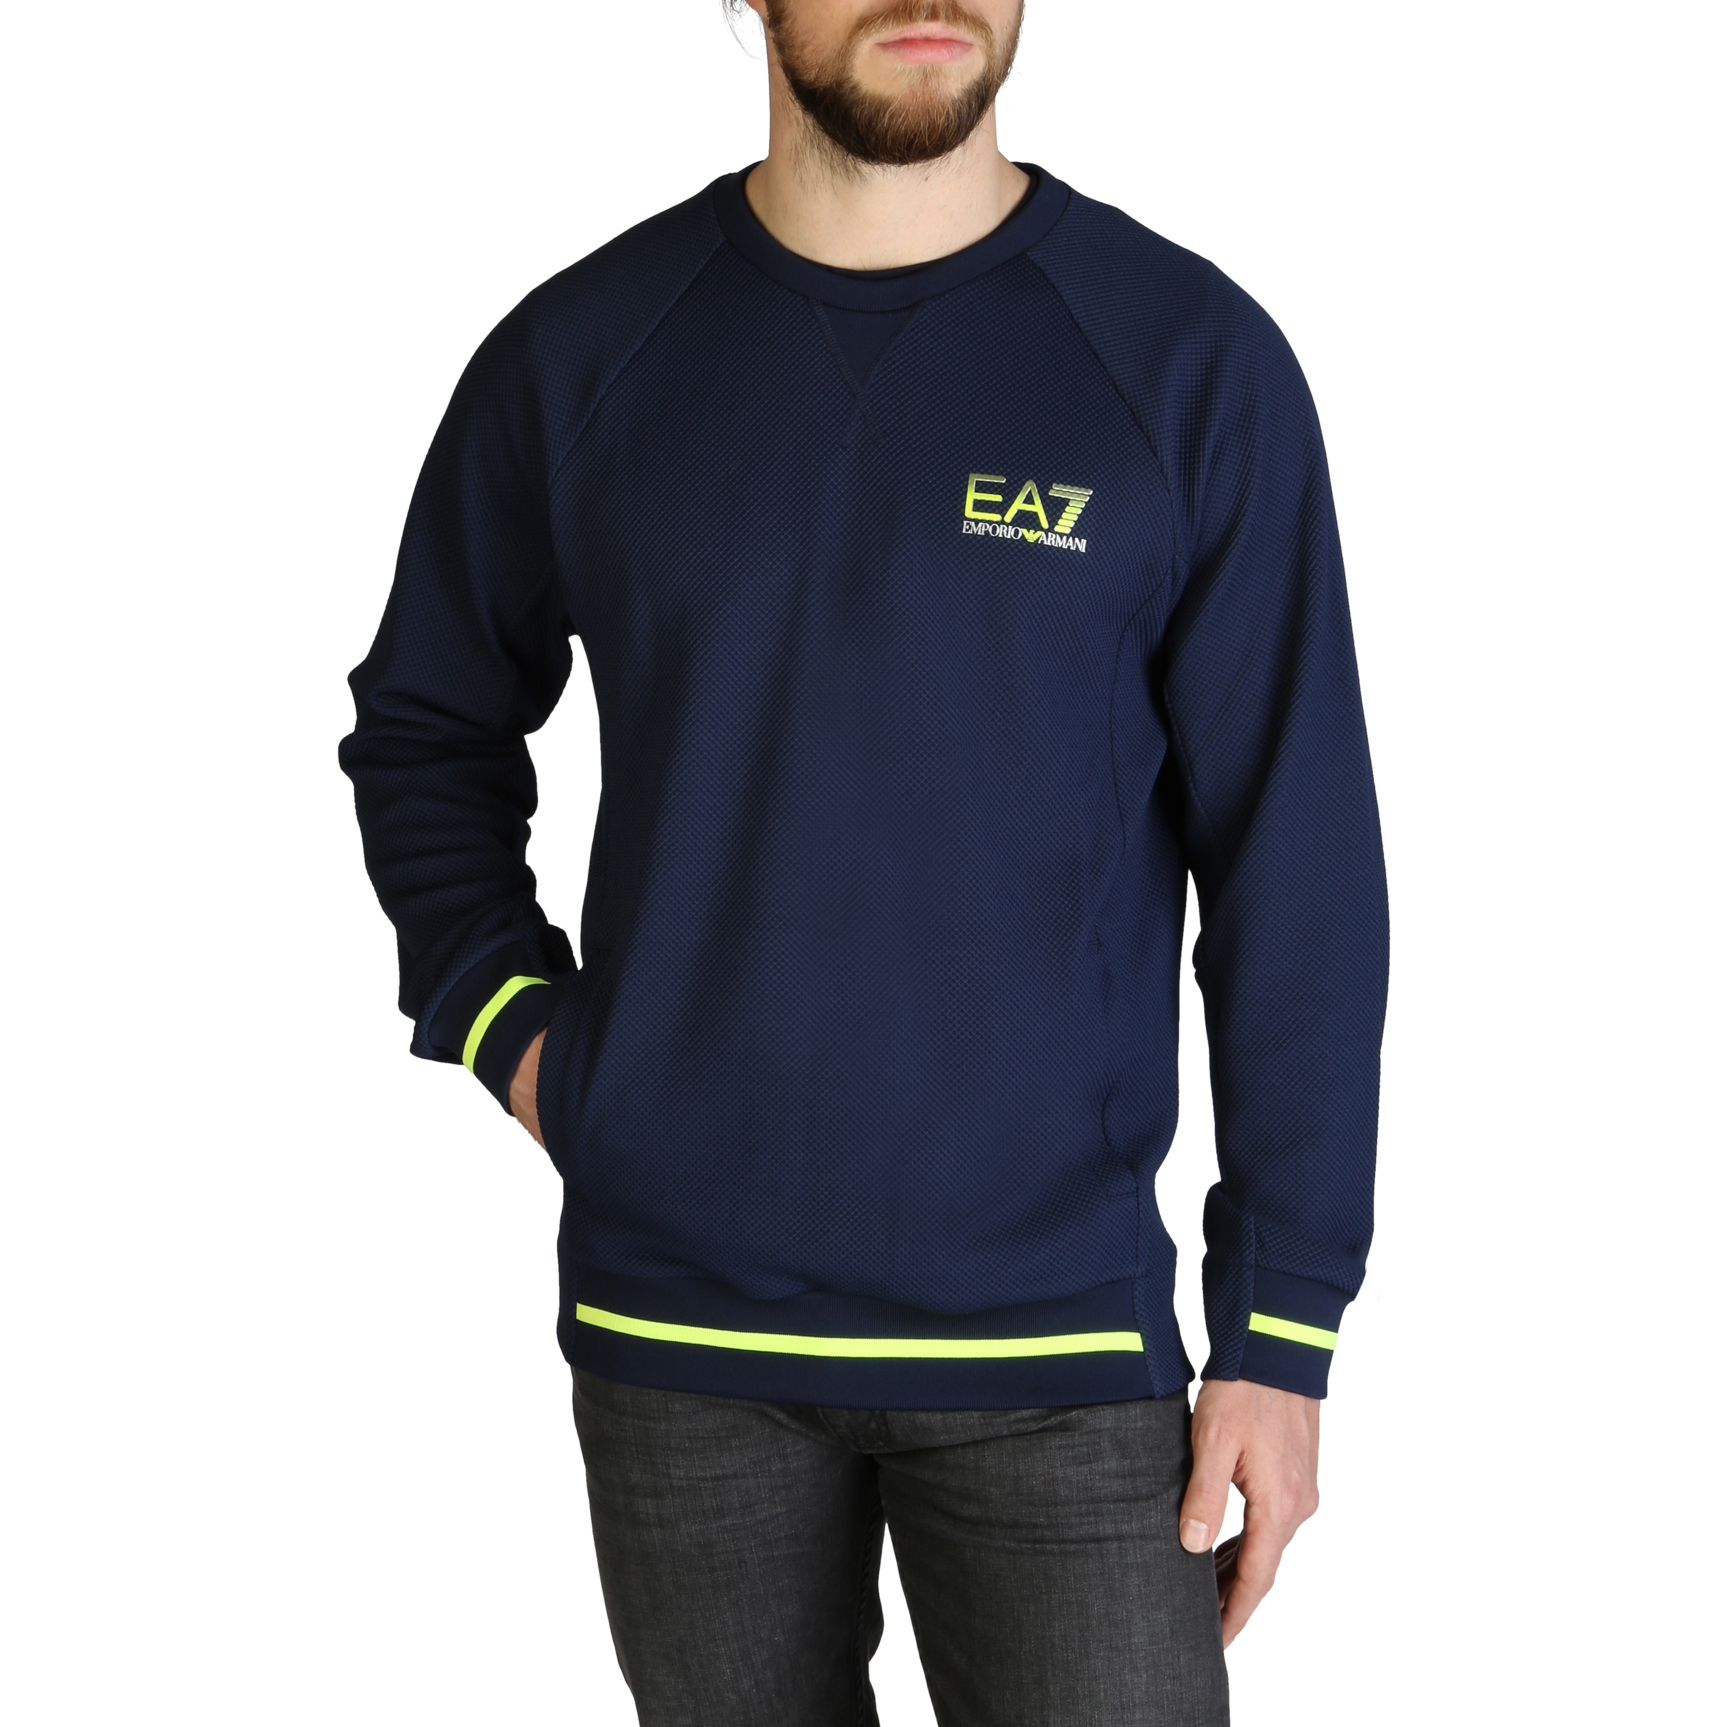 Mergi la Bluze sport Ea7 3ZPMC8_PJL1Z Albastru